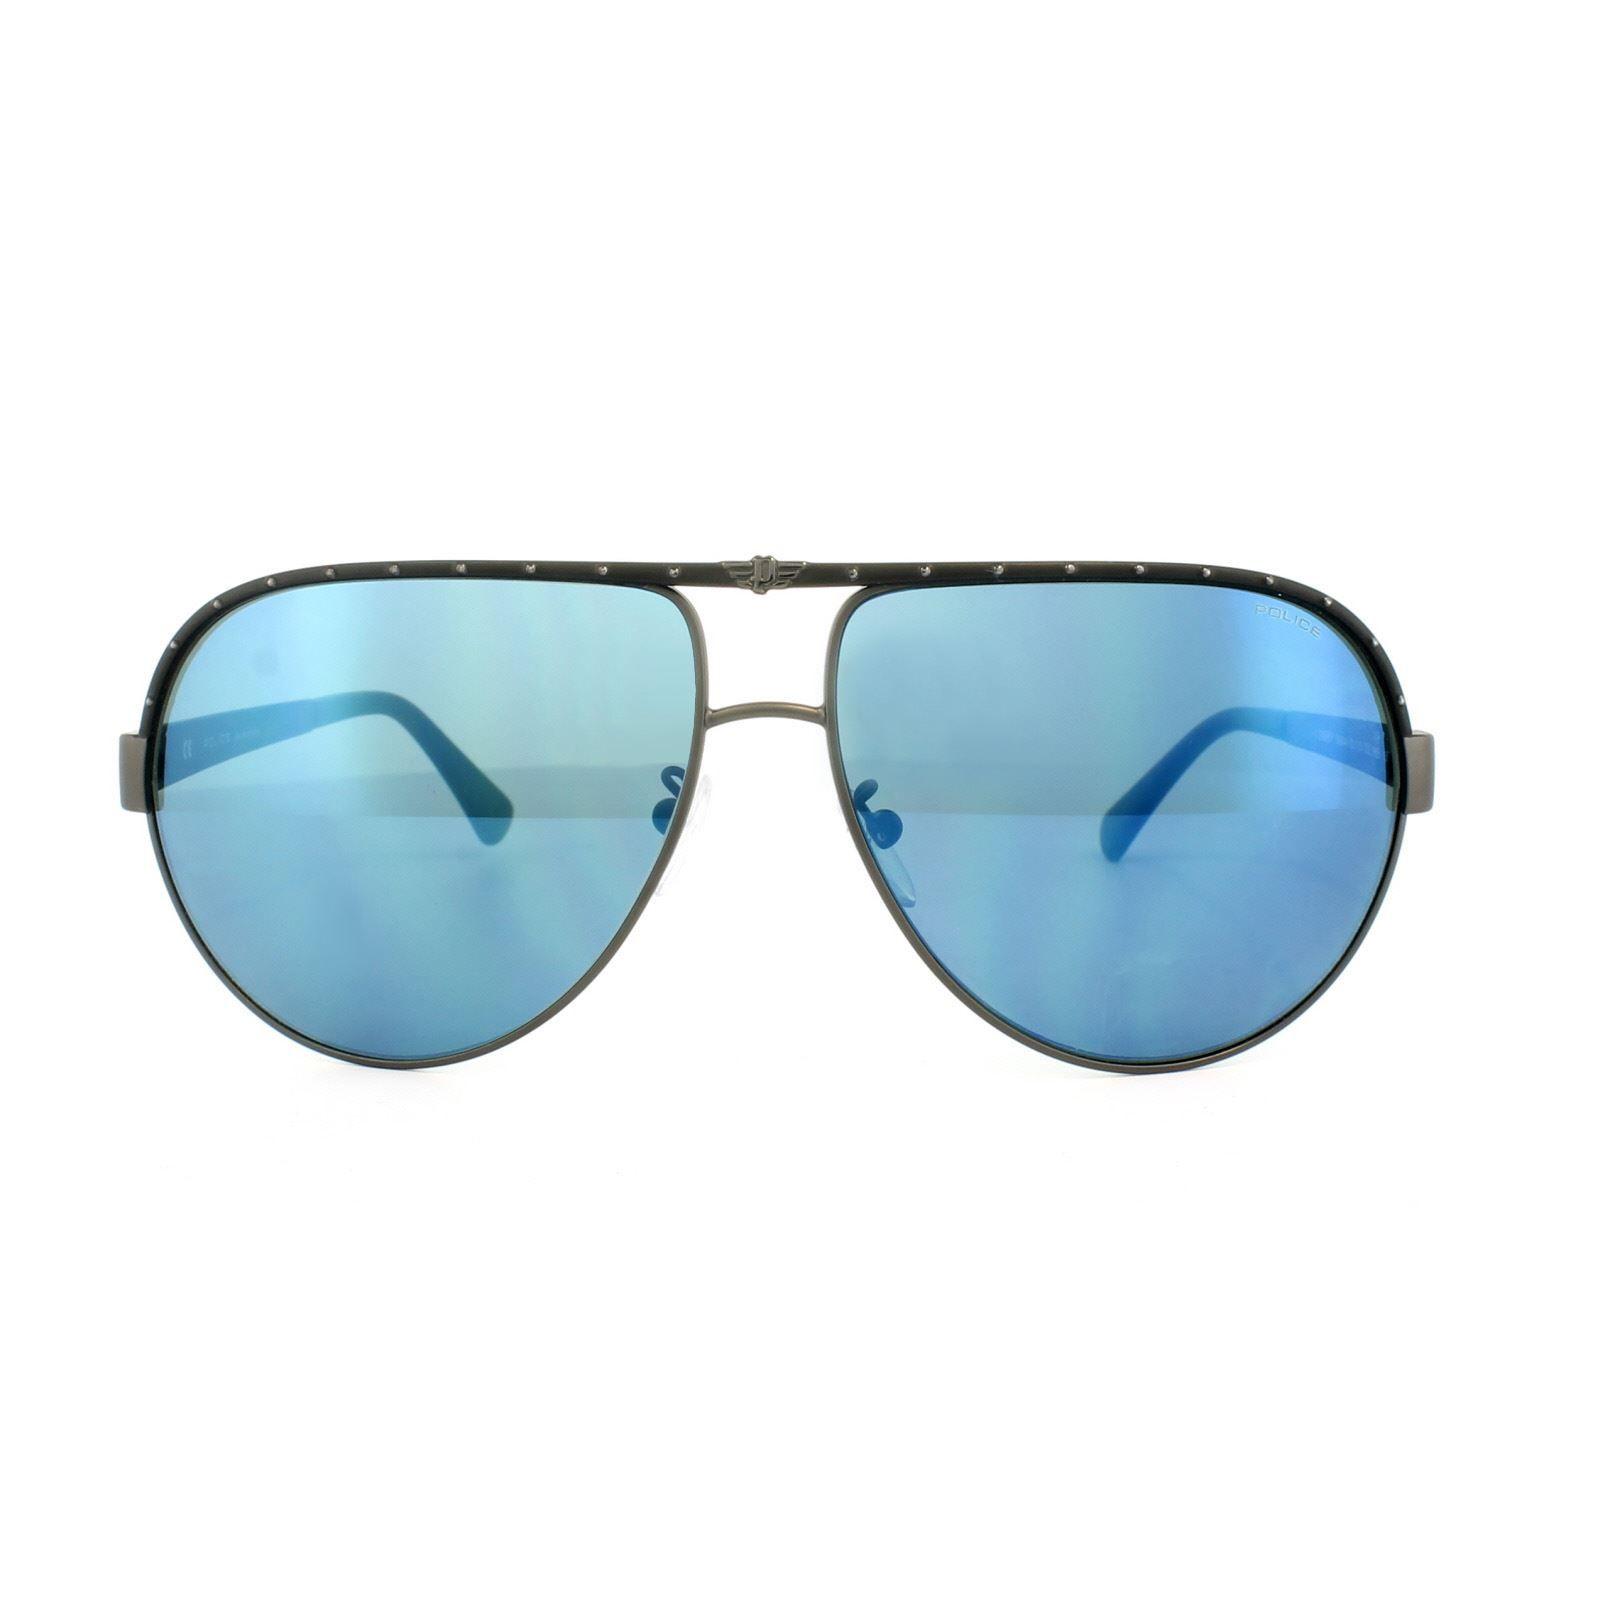 Police Sunglasses S8844 Spark 1 8H5B Matt Gunmetal Blue Mirror